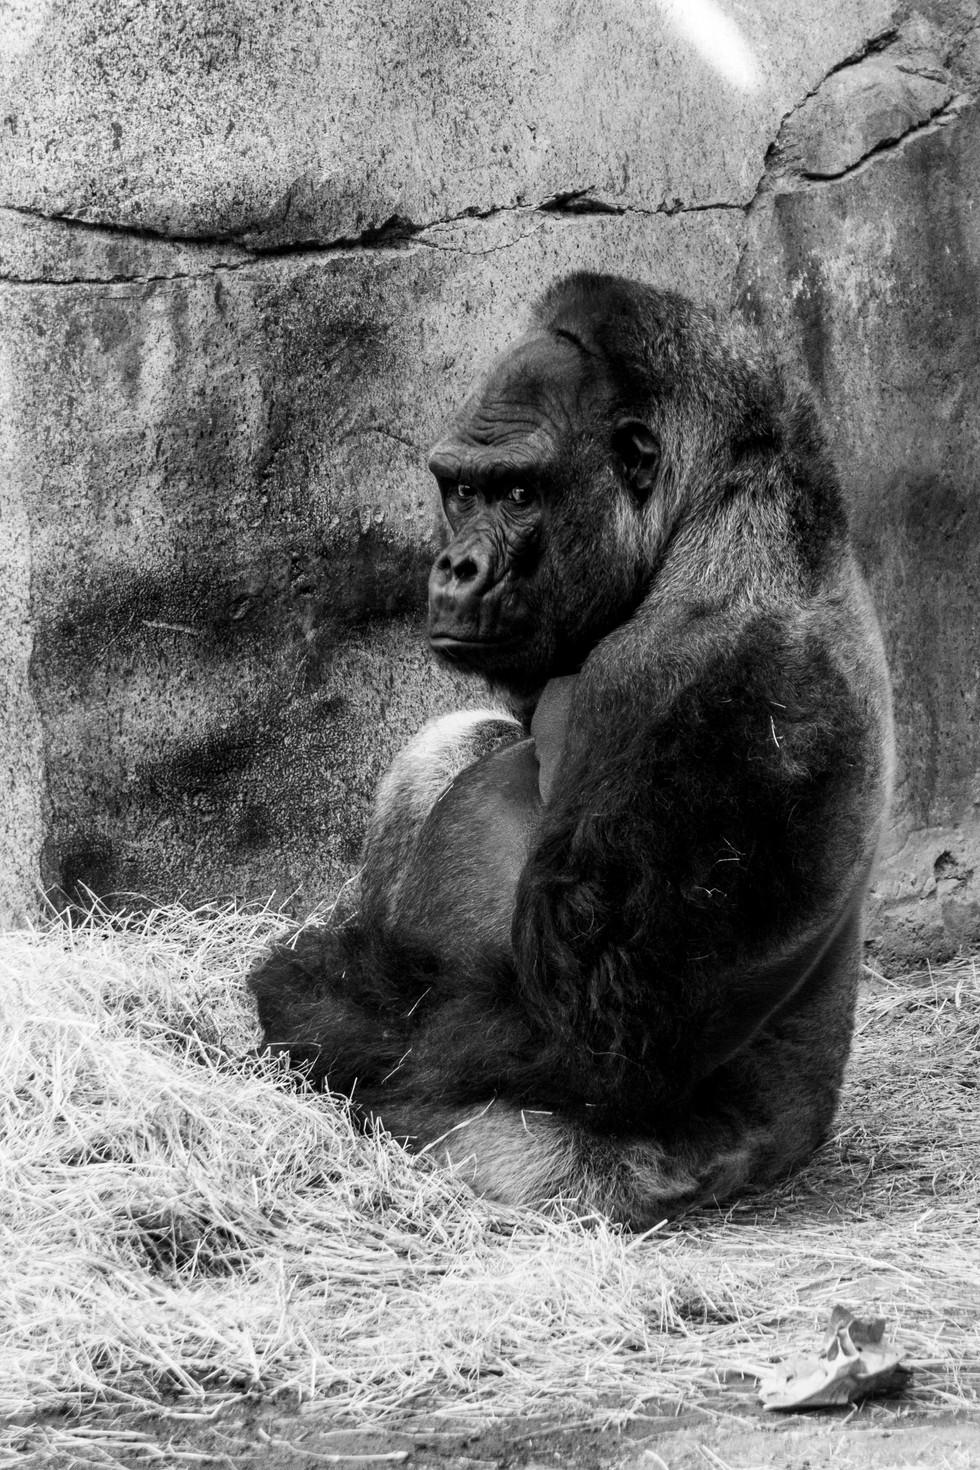 Fort Worth Zoo Gorilla